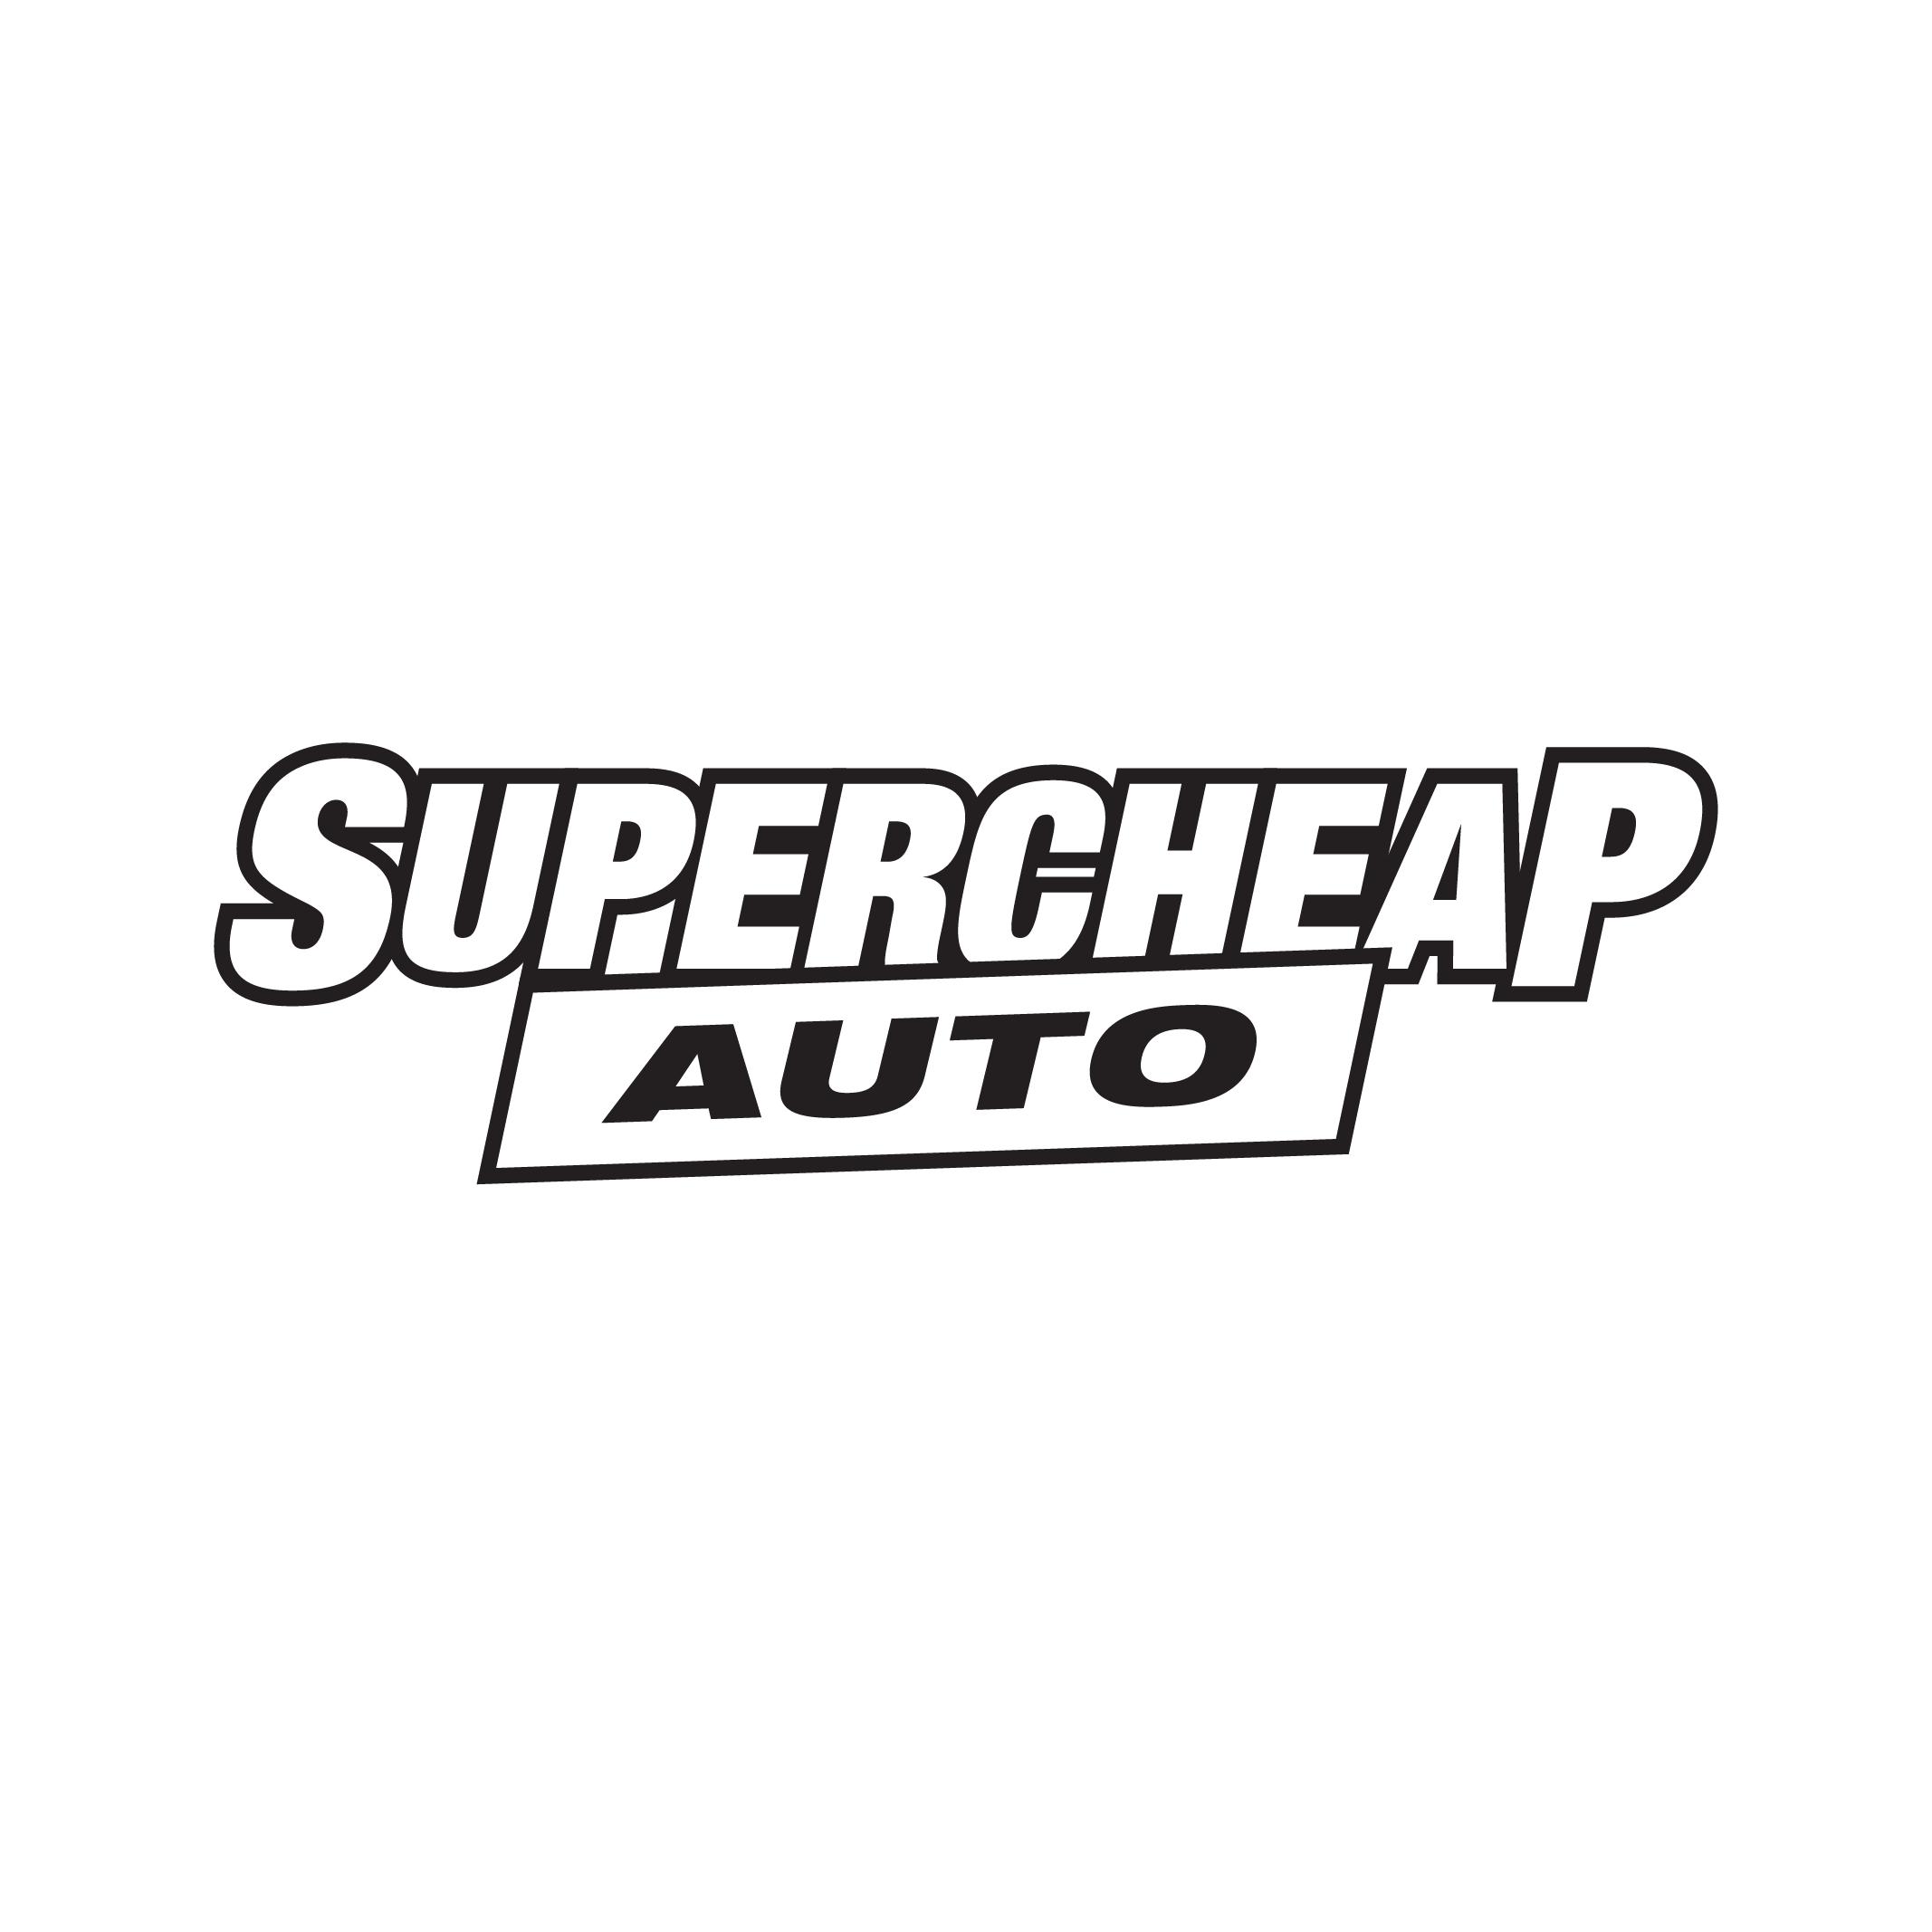 Supercheap-Auto